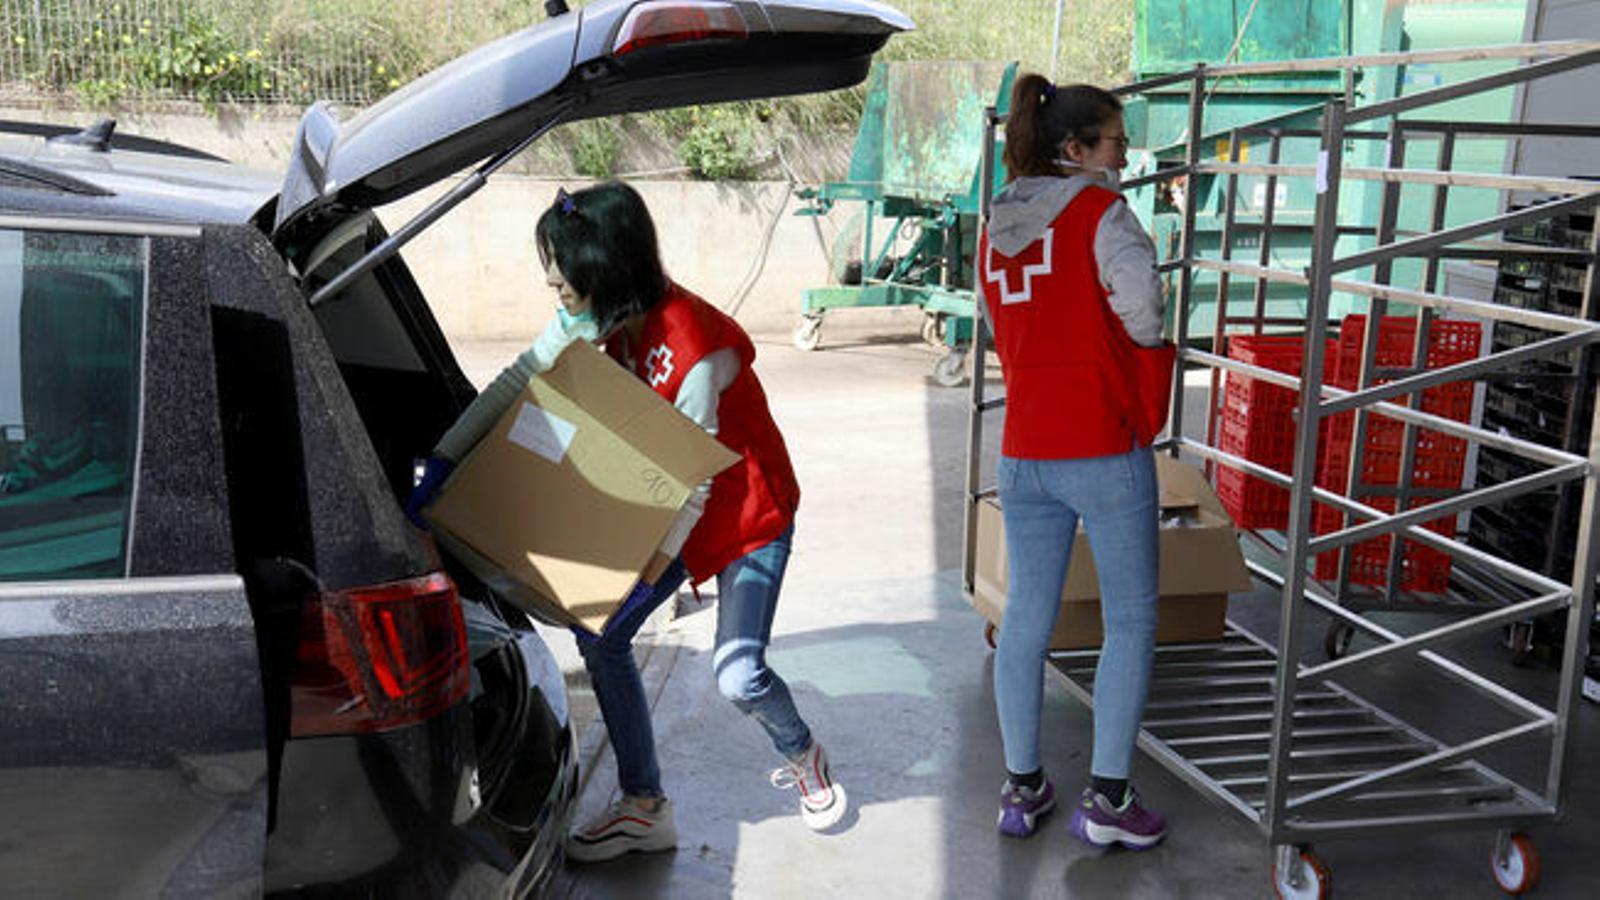 Voluntaris de Creu Roja / ISAAC BUJ